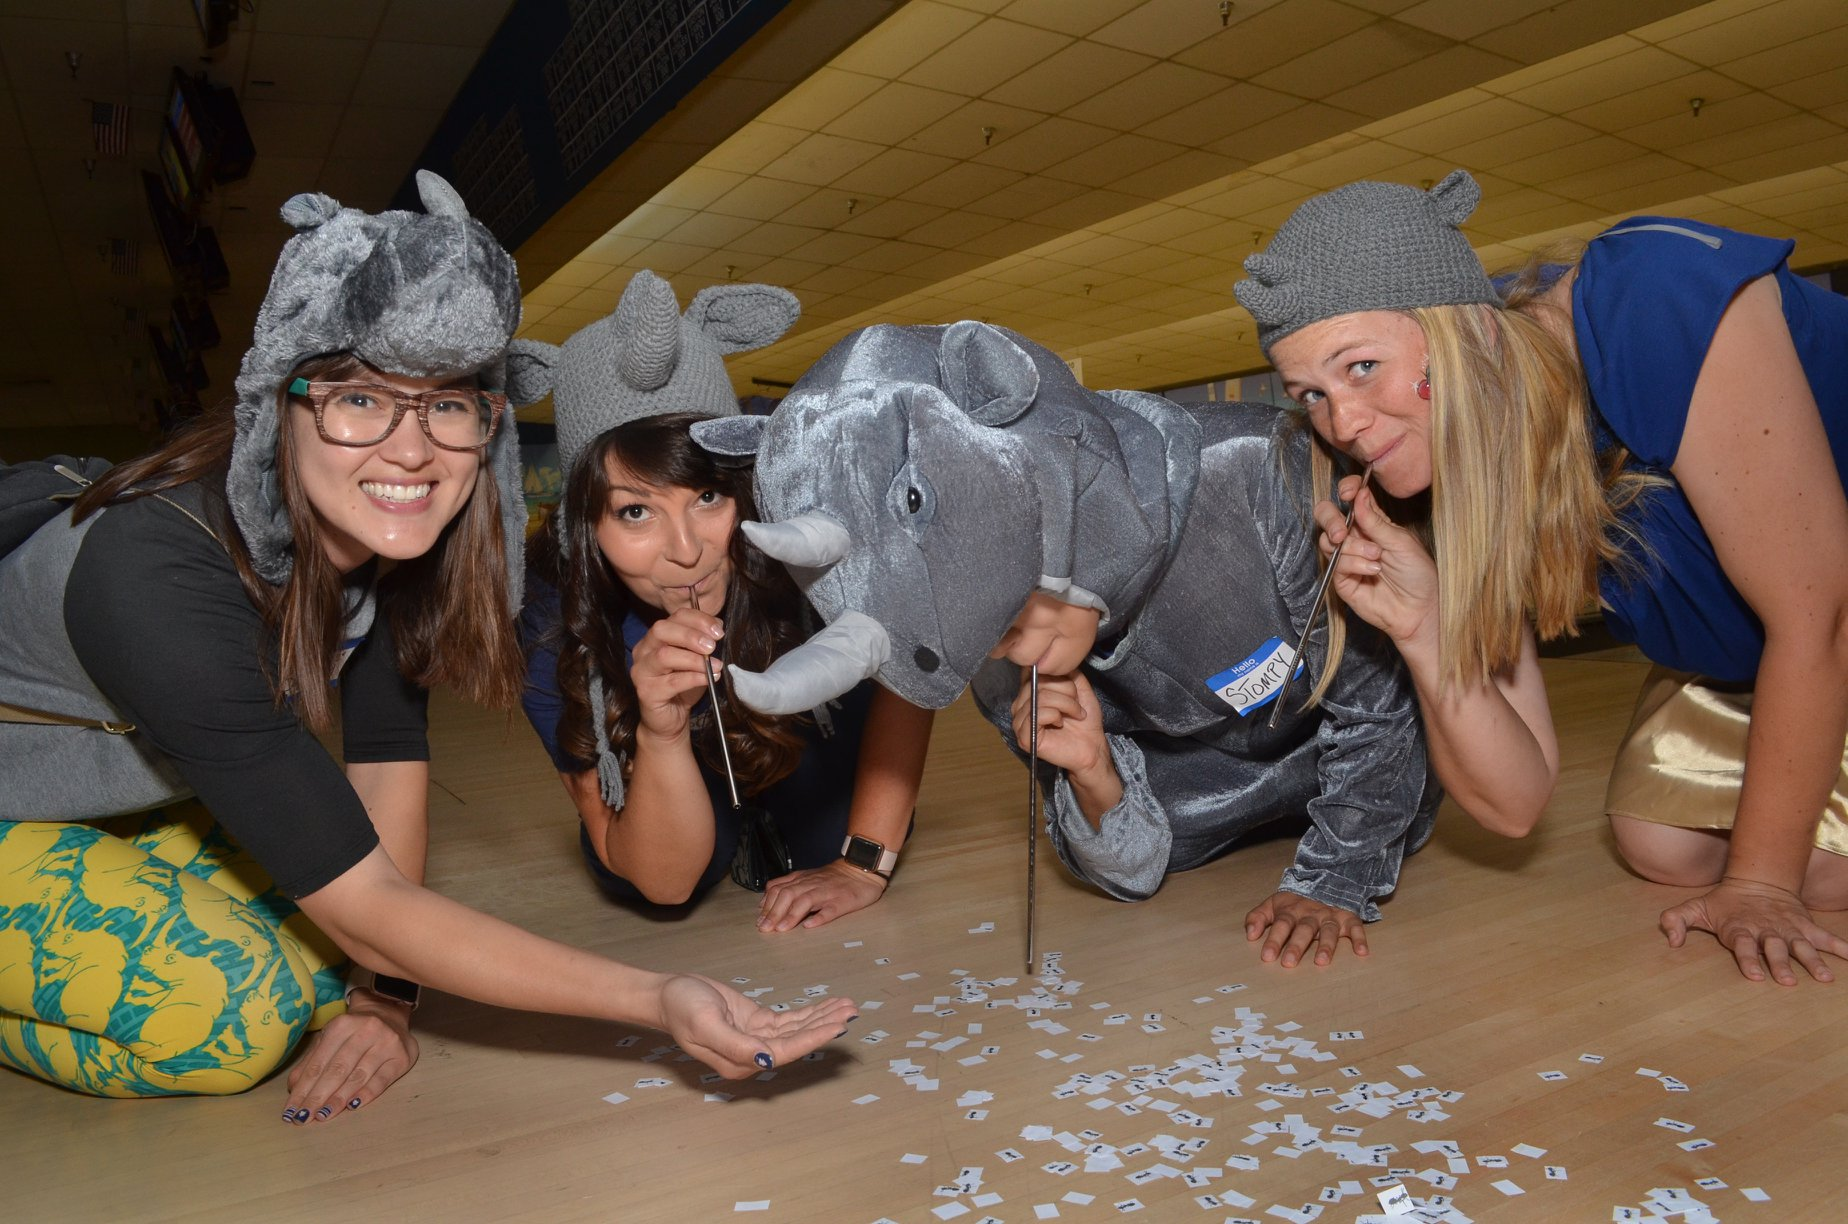 San Diego Zoo, Bowling for rhinos, rhino conservation